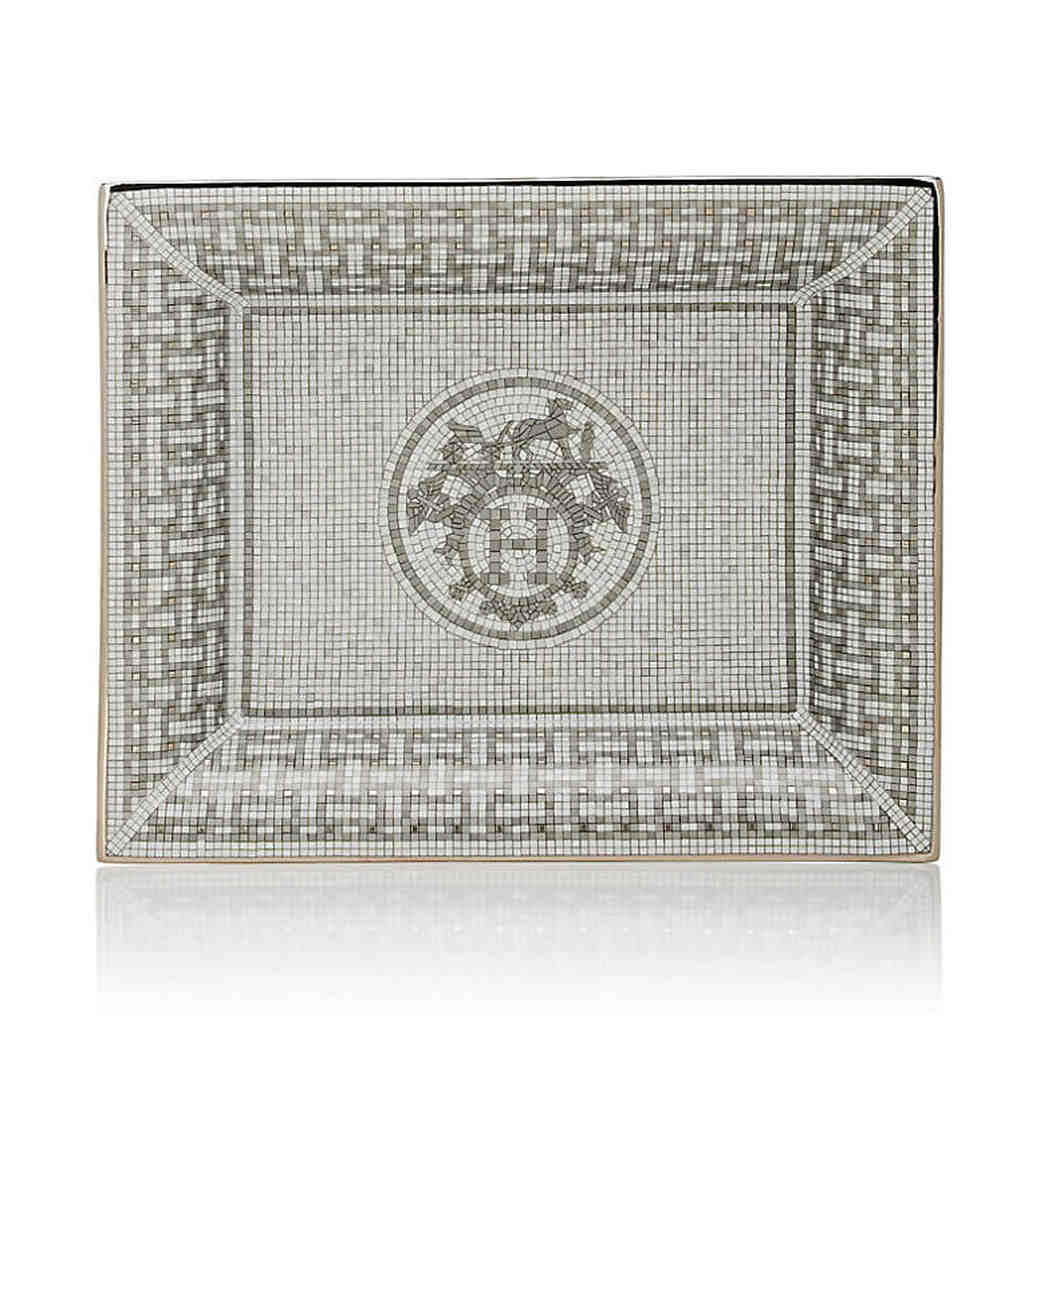 platinum anniversary gifts hermes tray